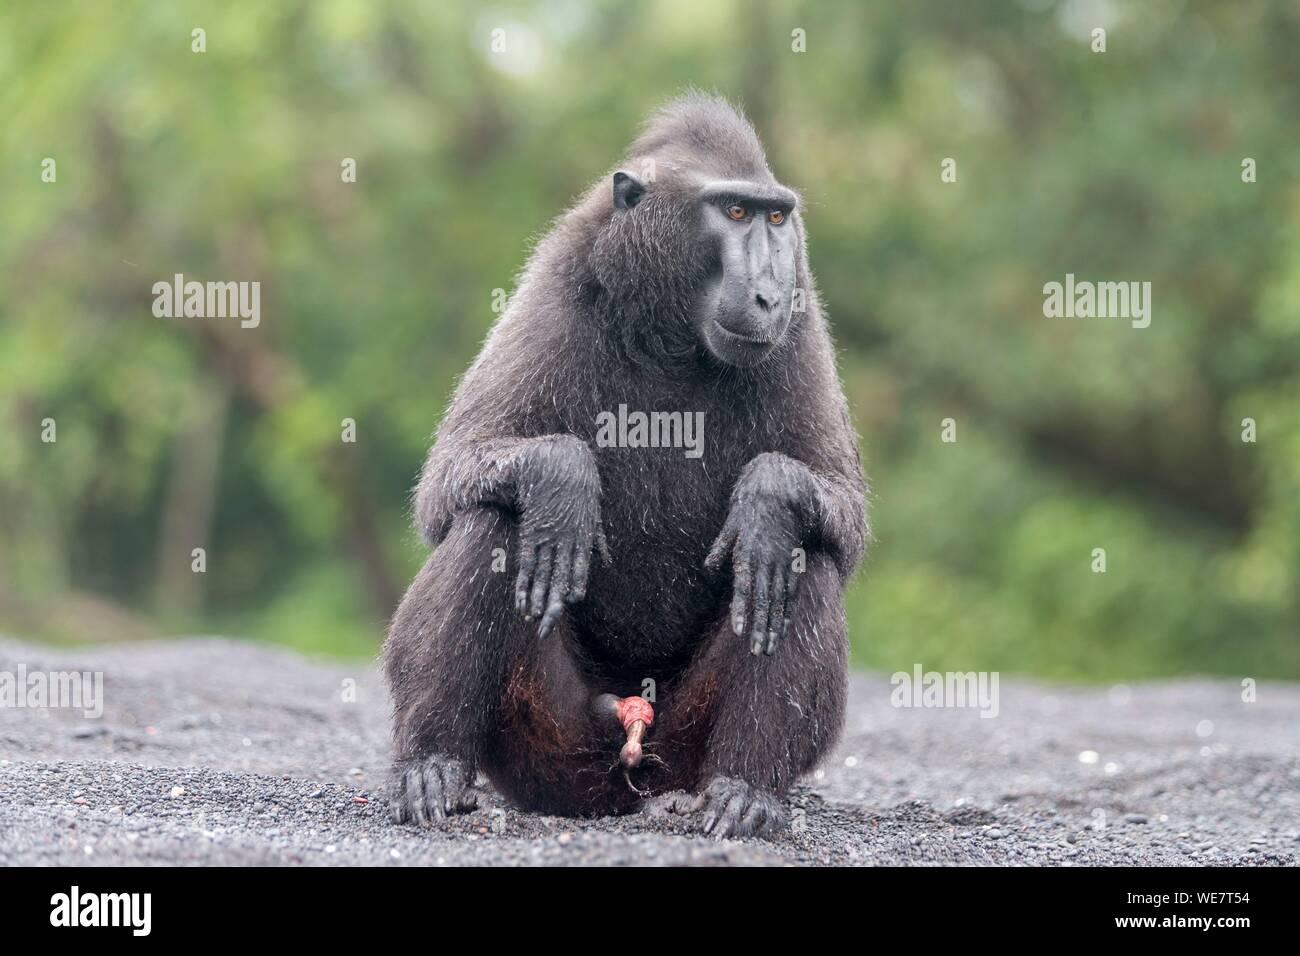 Indonesien, Celebes, Sulawesi, Tangkoko National Park, Celebes crested Macaque oder Crested schwarzen Makaken, Sulawesi crested Makaken, oder die schwarze Ape (Macaca nigra) Stockfoto